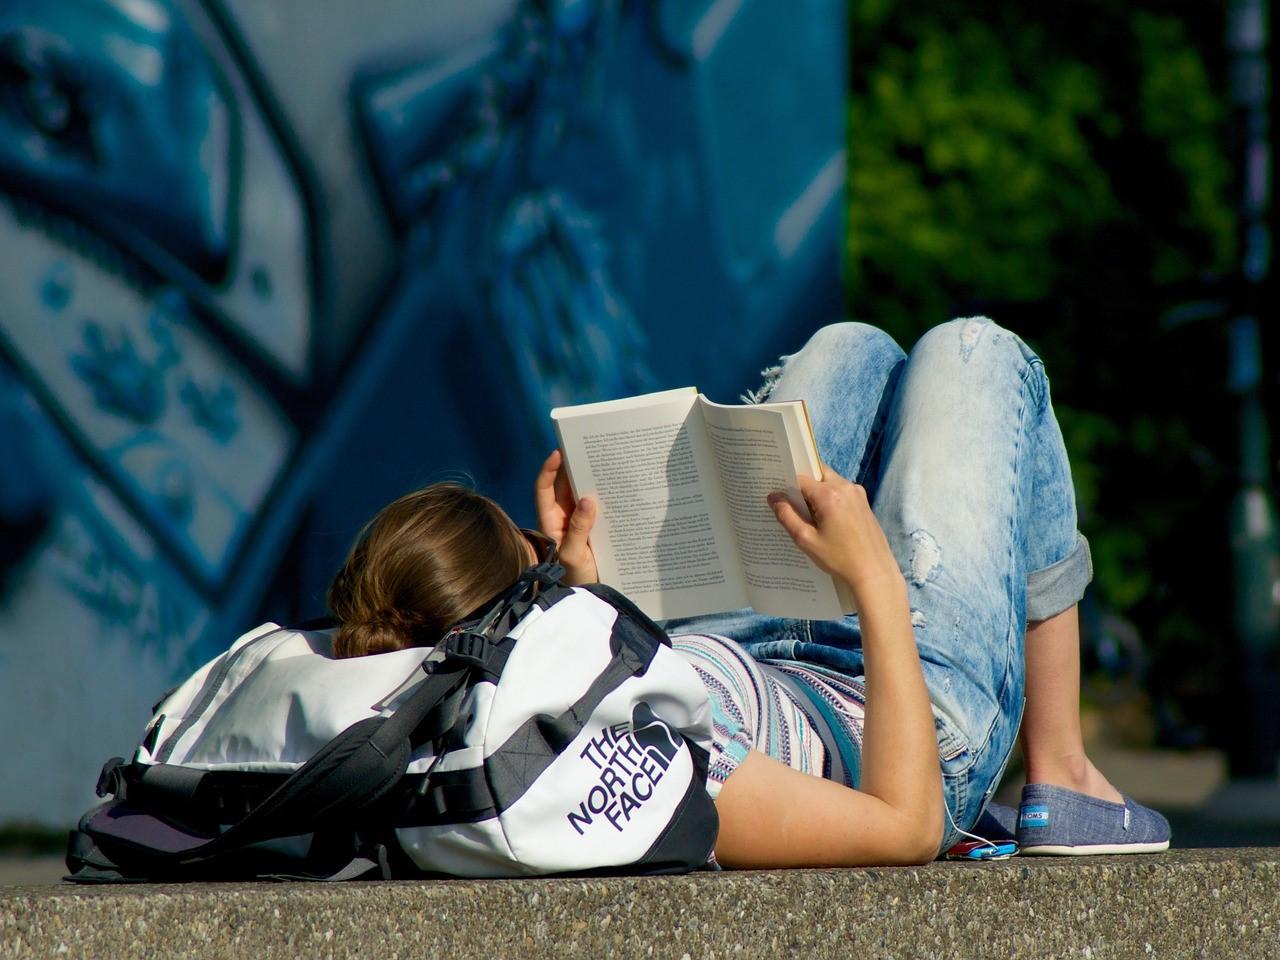 woman reading, rucksack, lying on ground